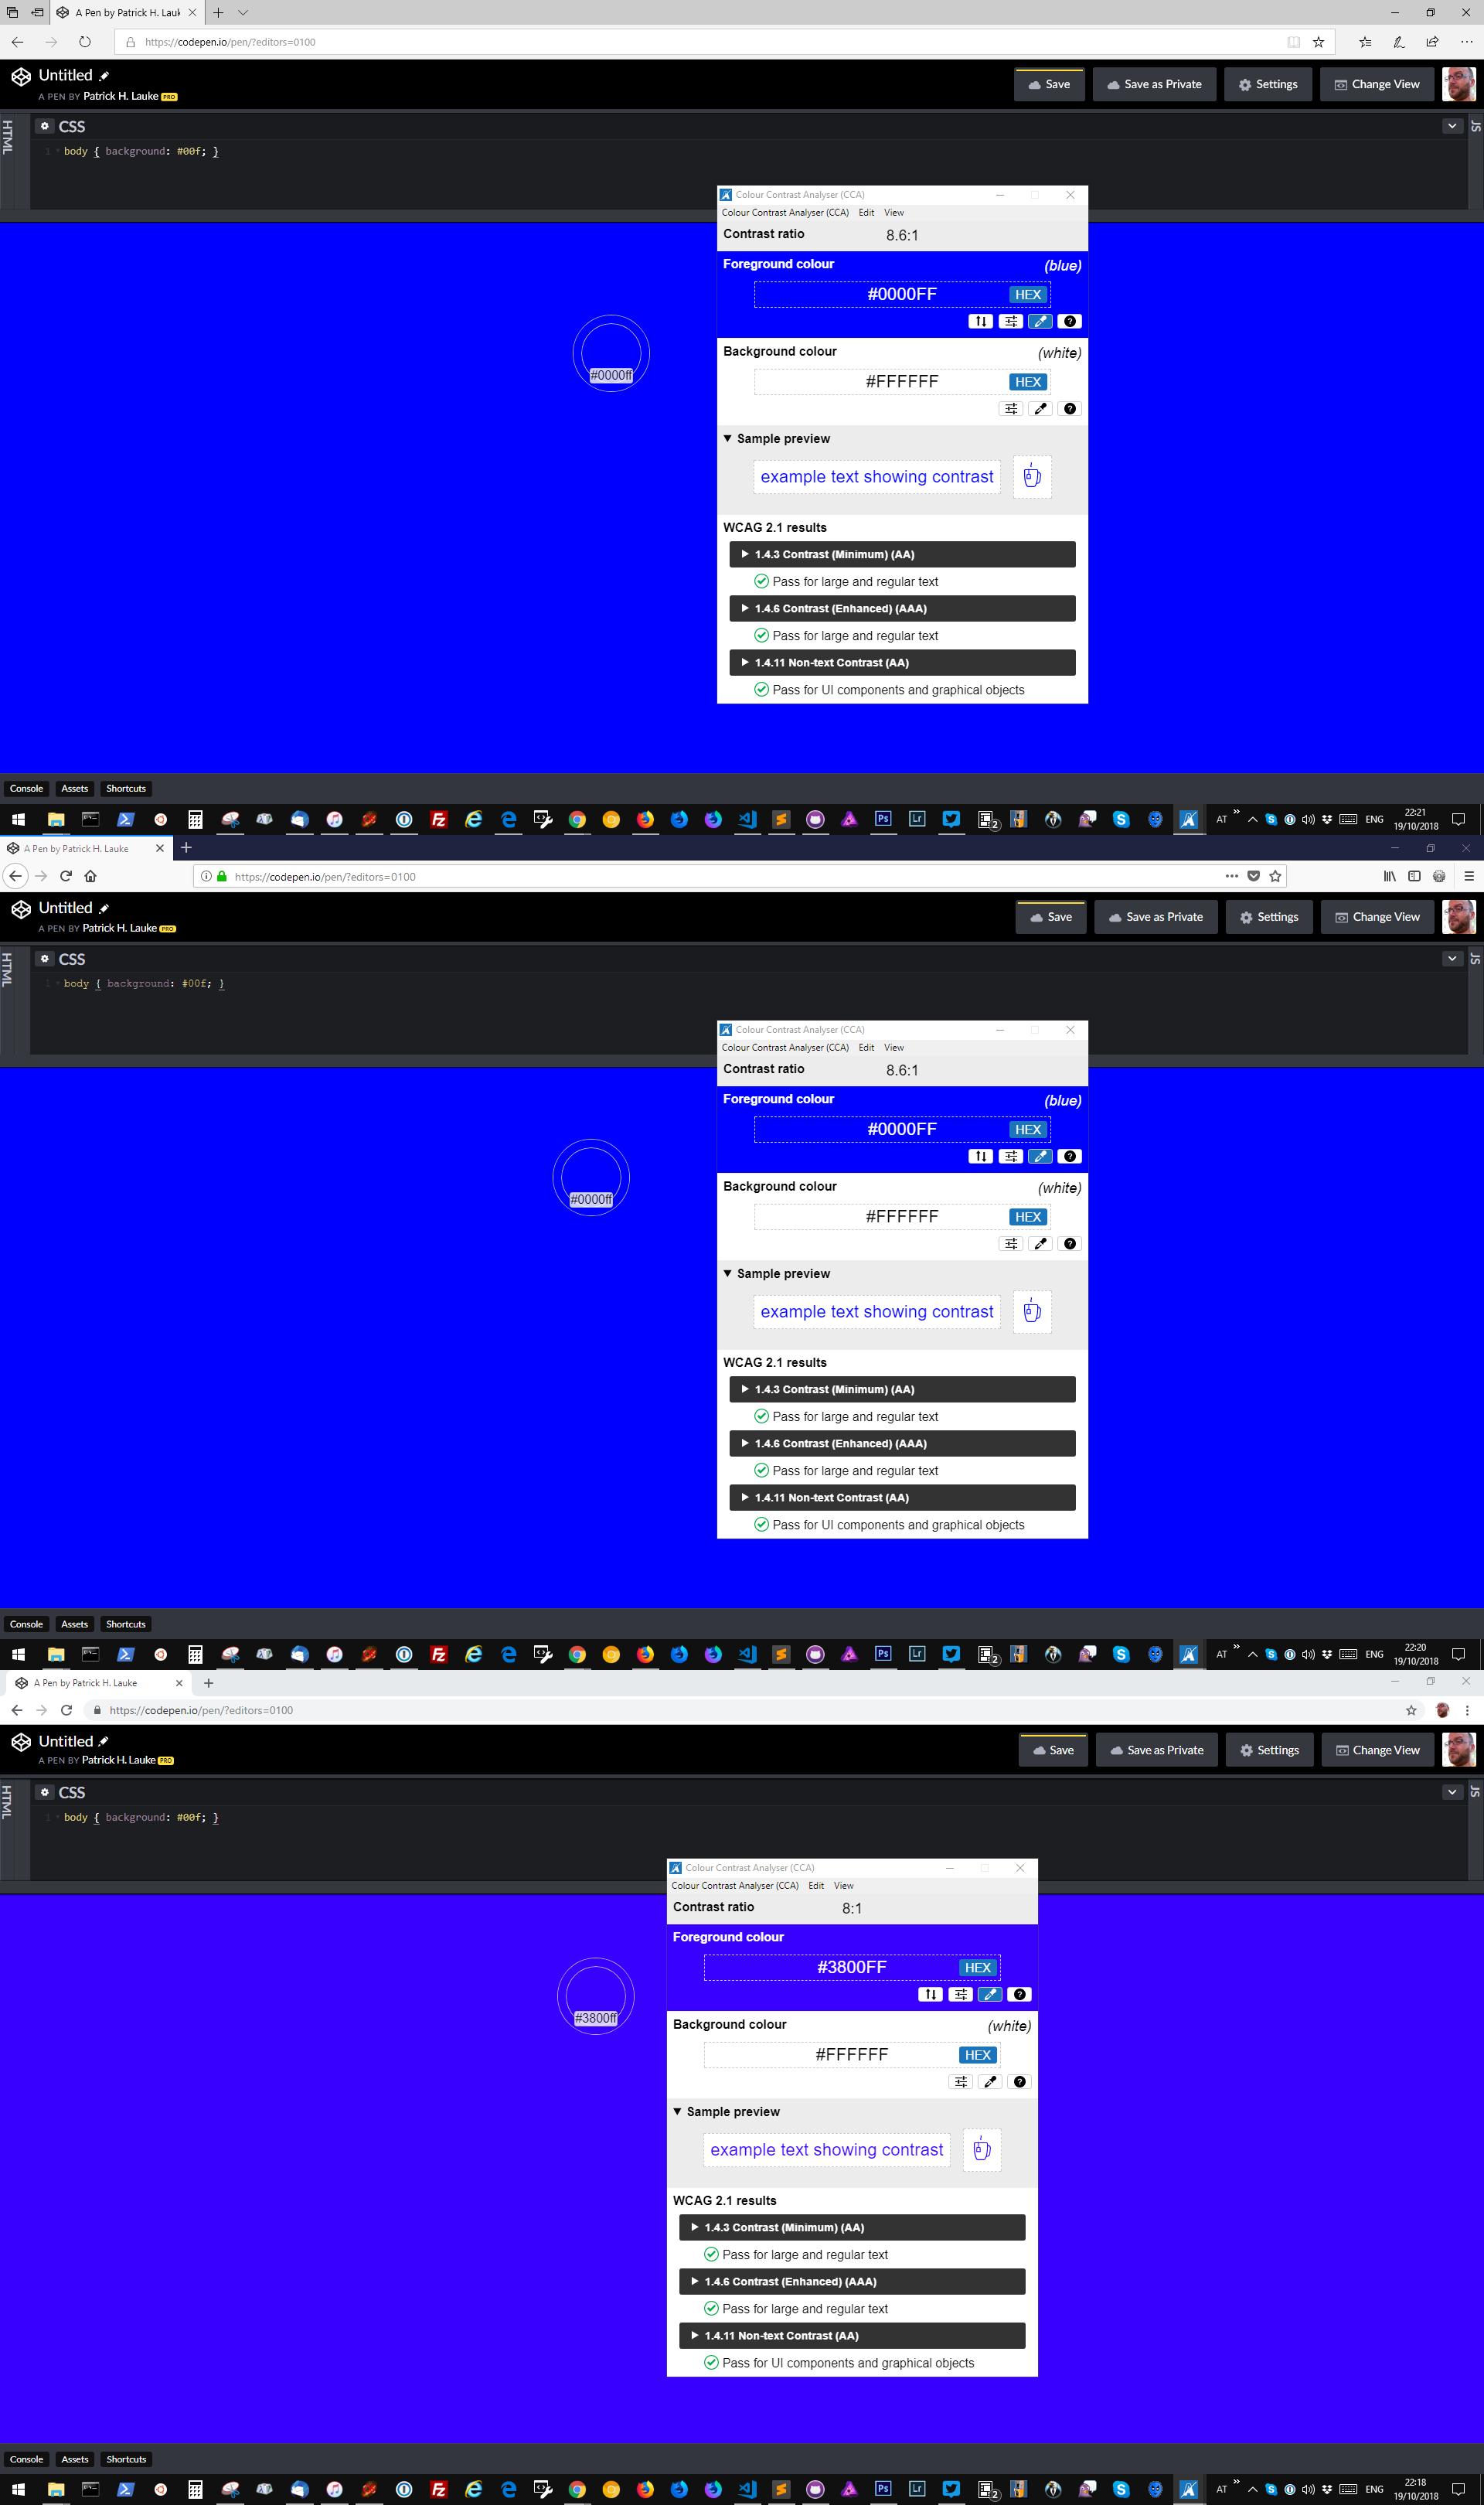 Color picker picks the color *after* browser/application color